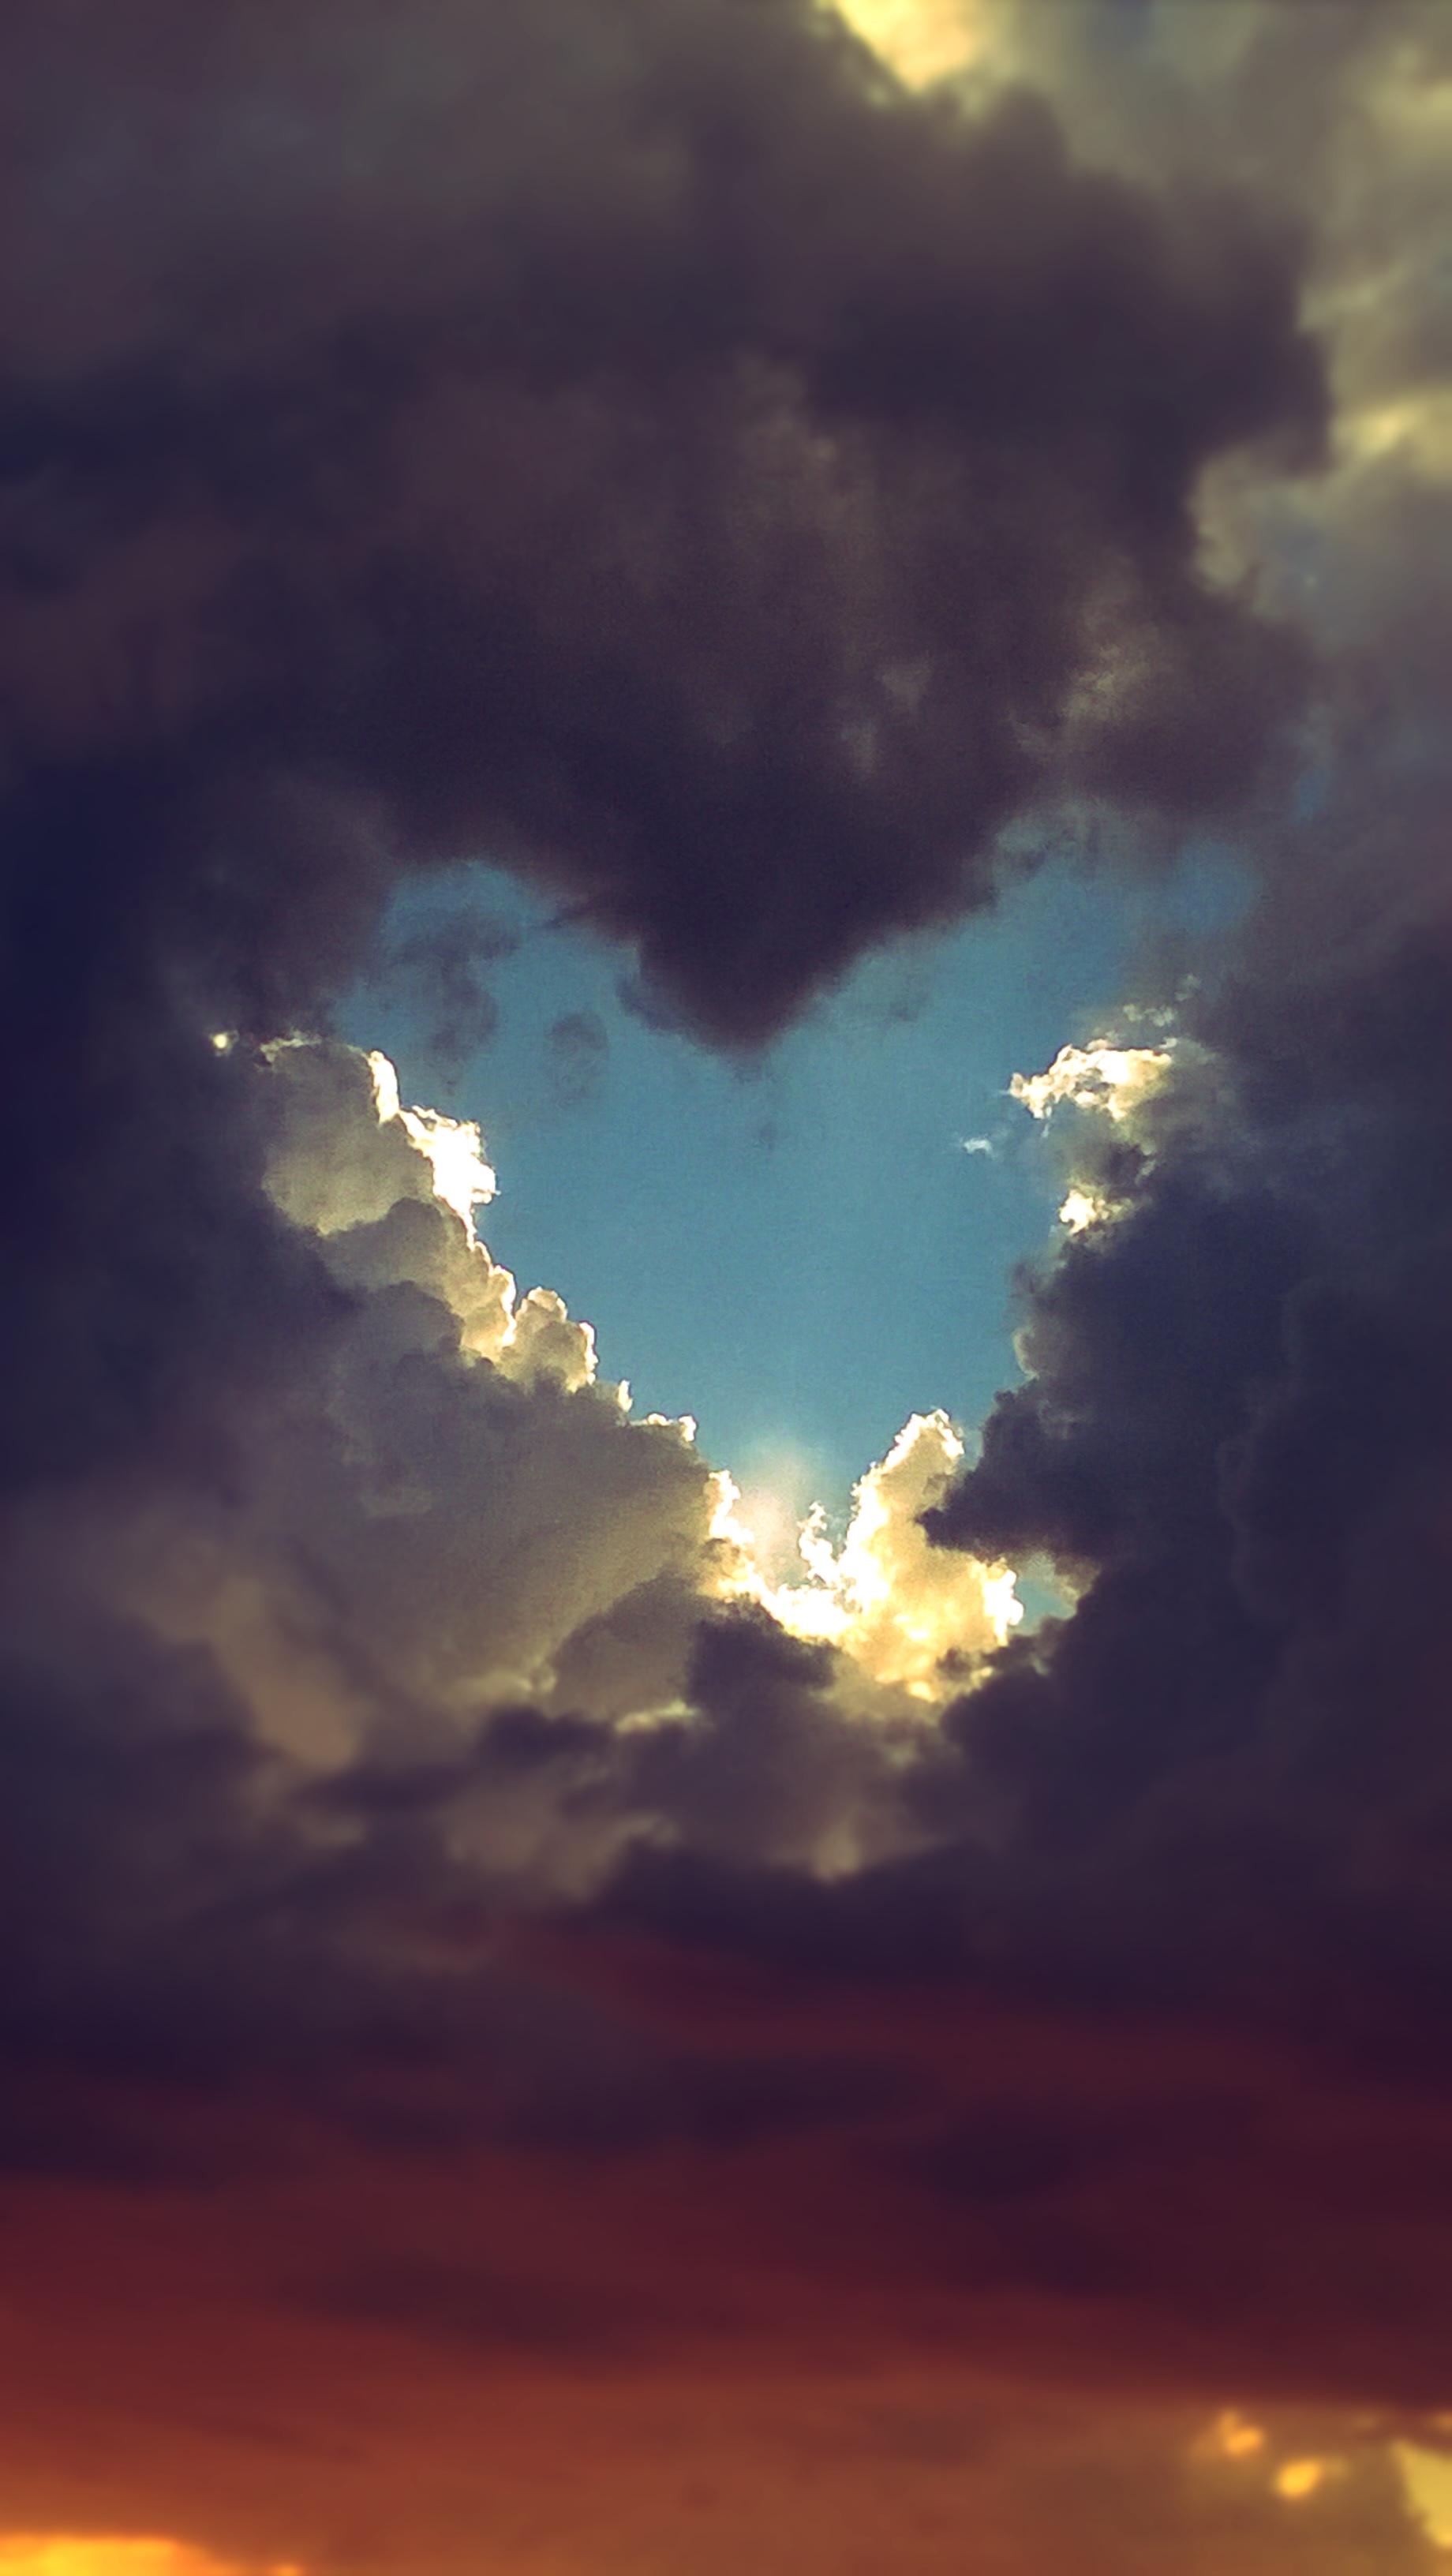 free photo: heart shaped break in the clouds - shape, romantic